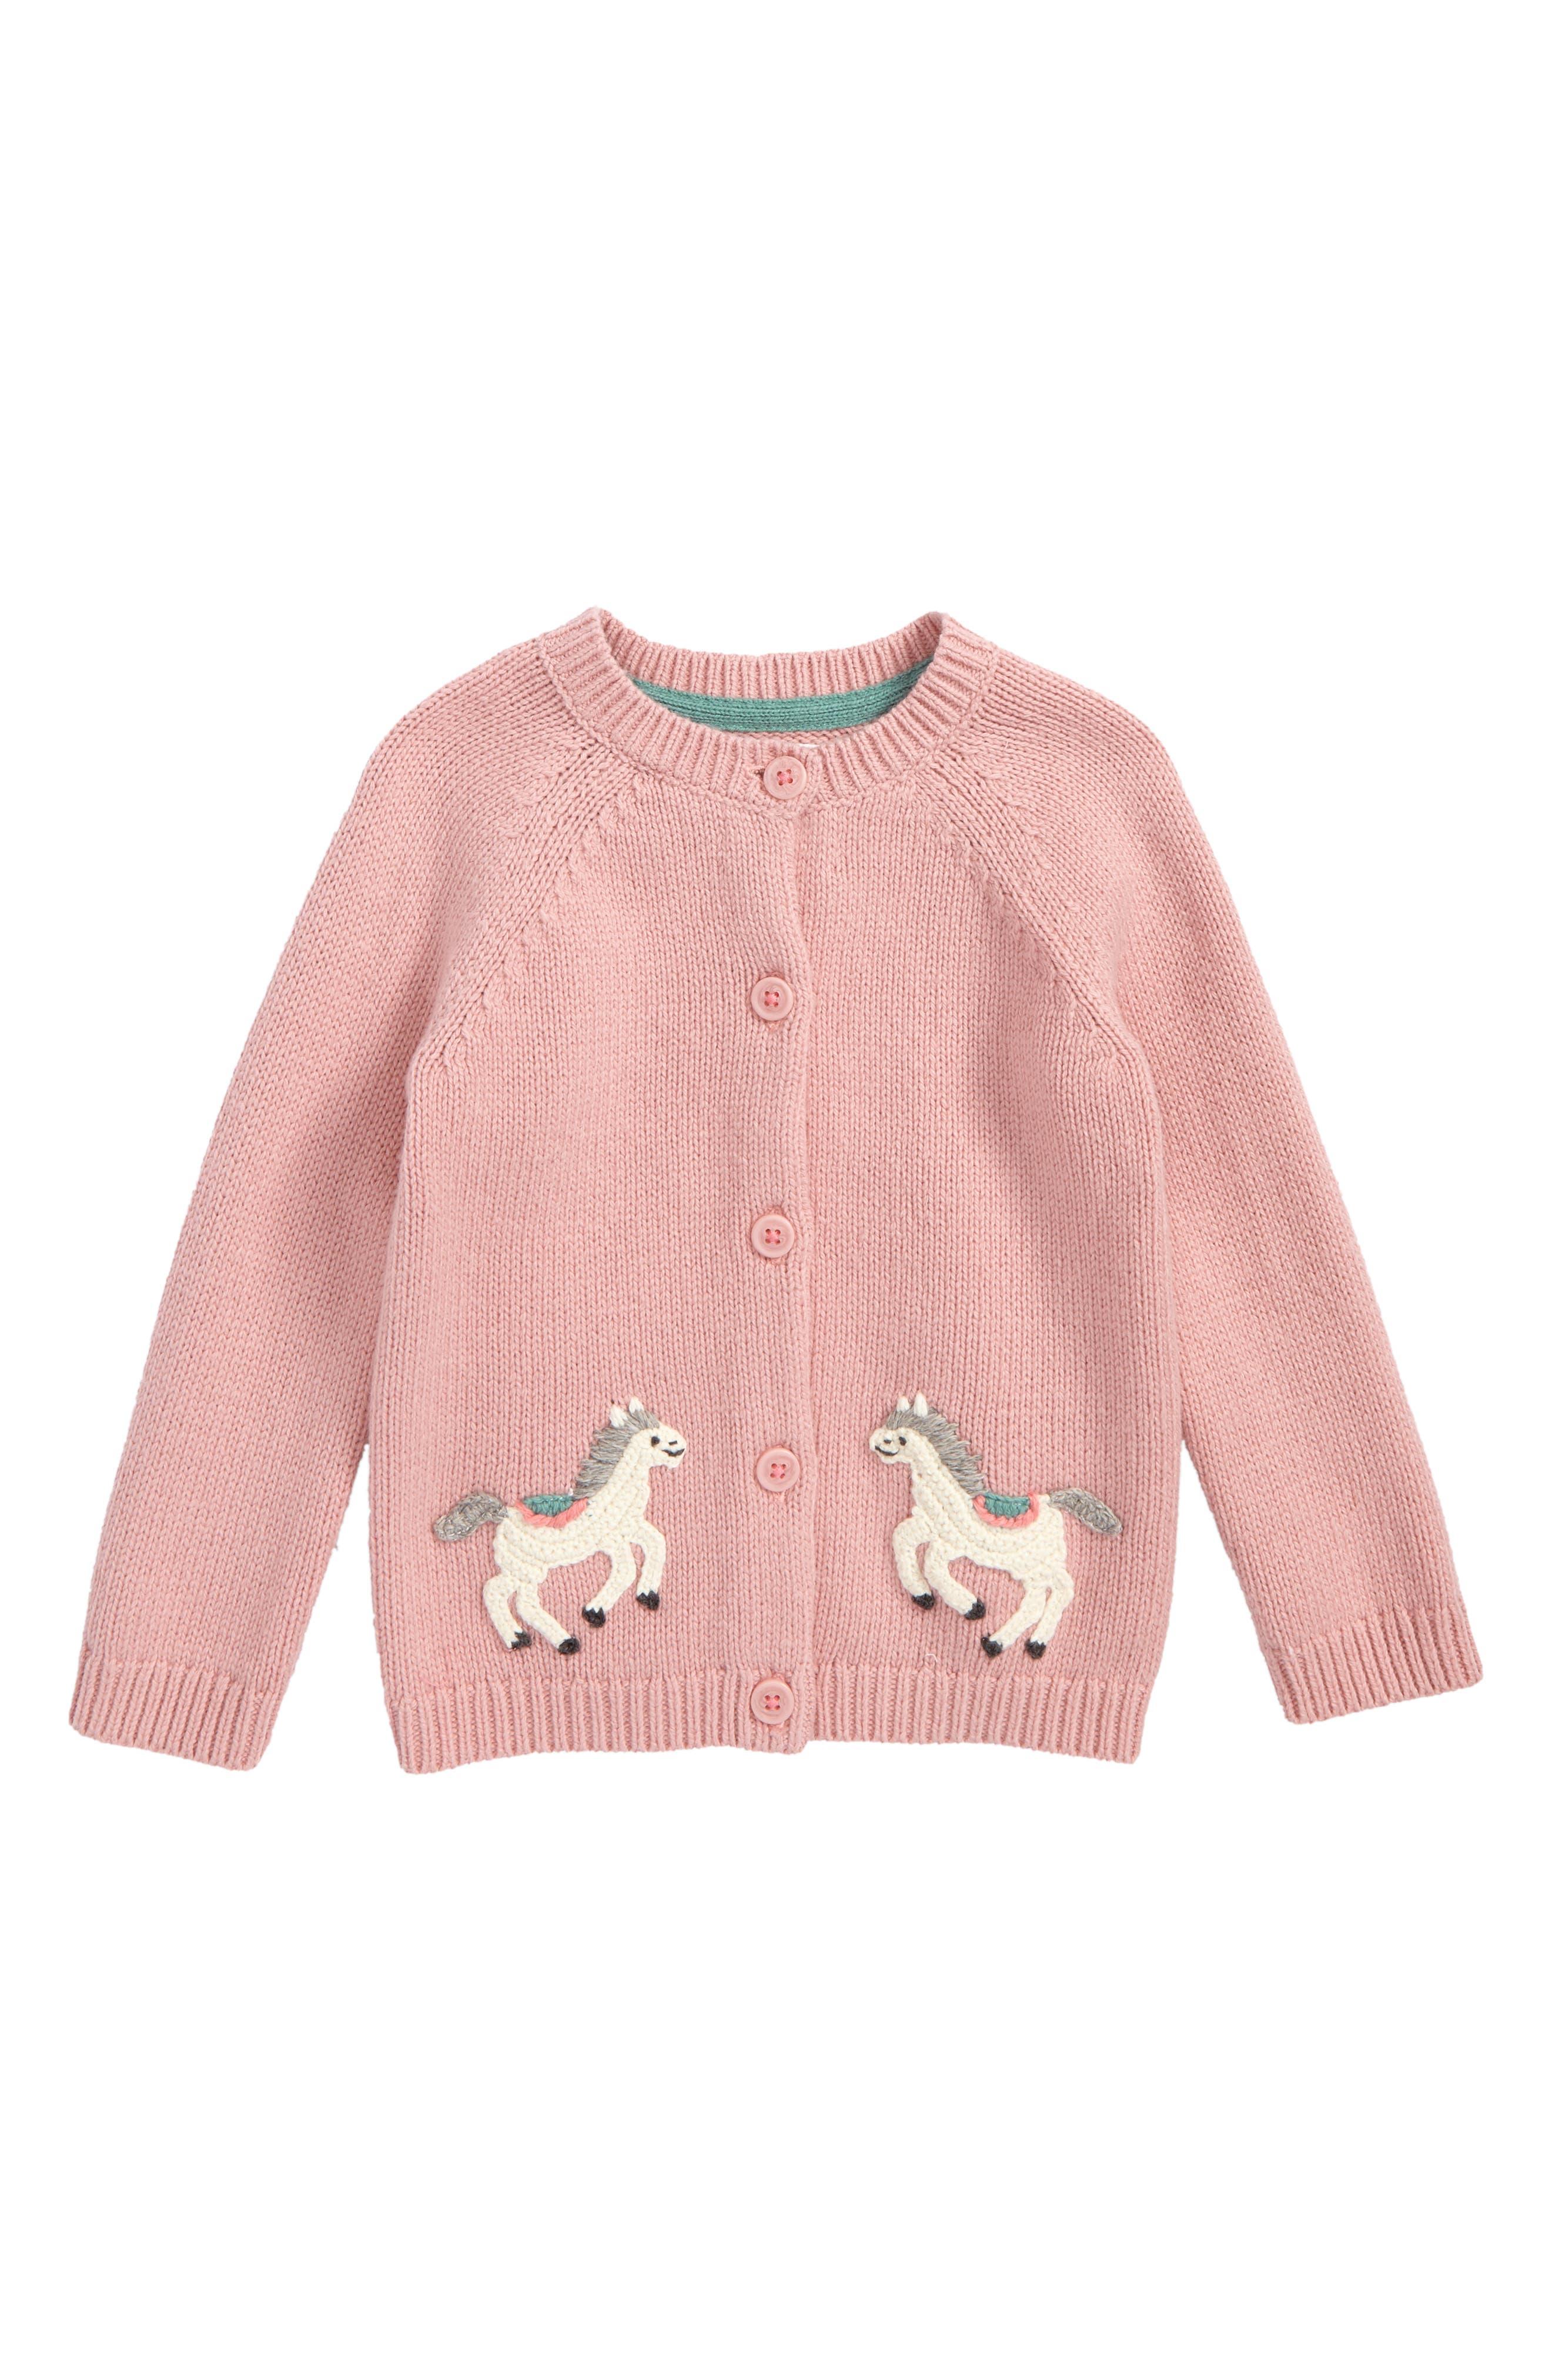 Crochet Pony Cardigan,                             Main thumbnail 1, color,                             Pink Almond Blossom